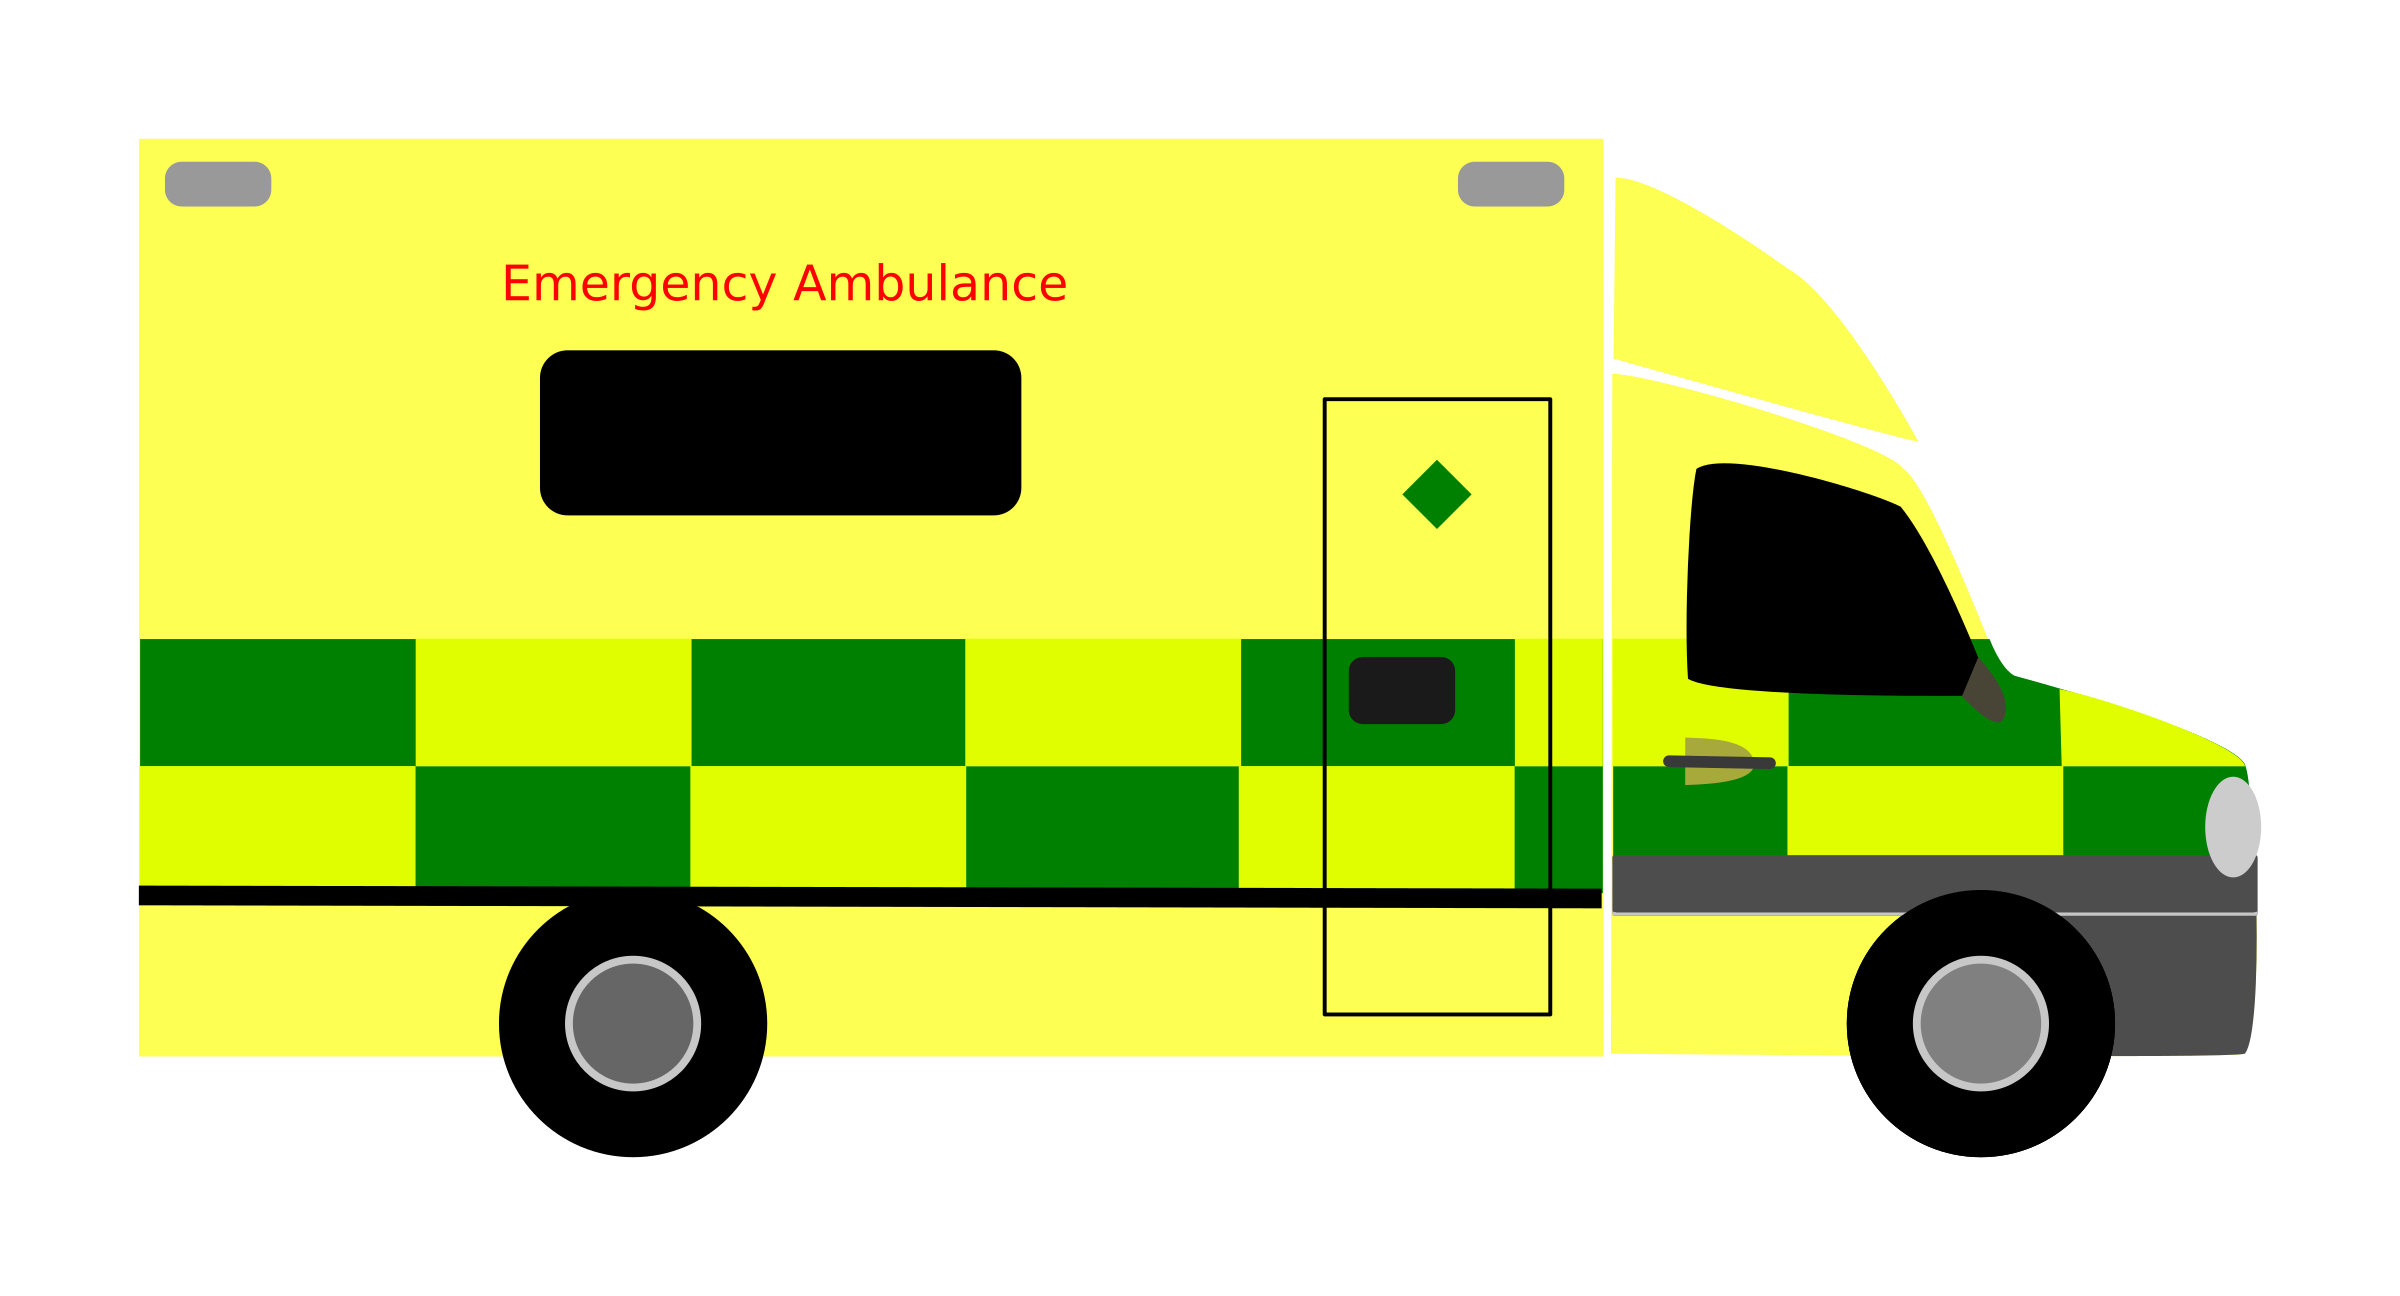 British big image png. Clipart images ambulance